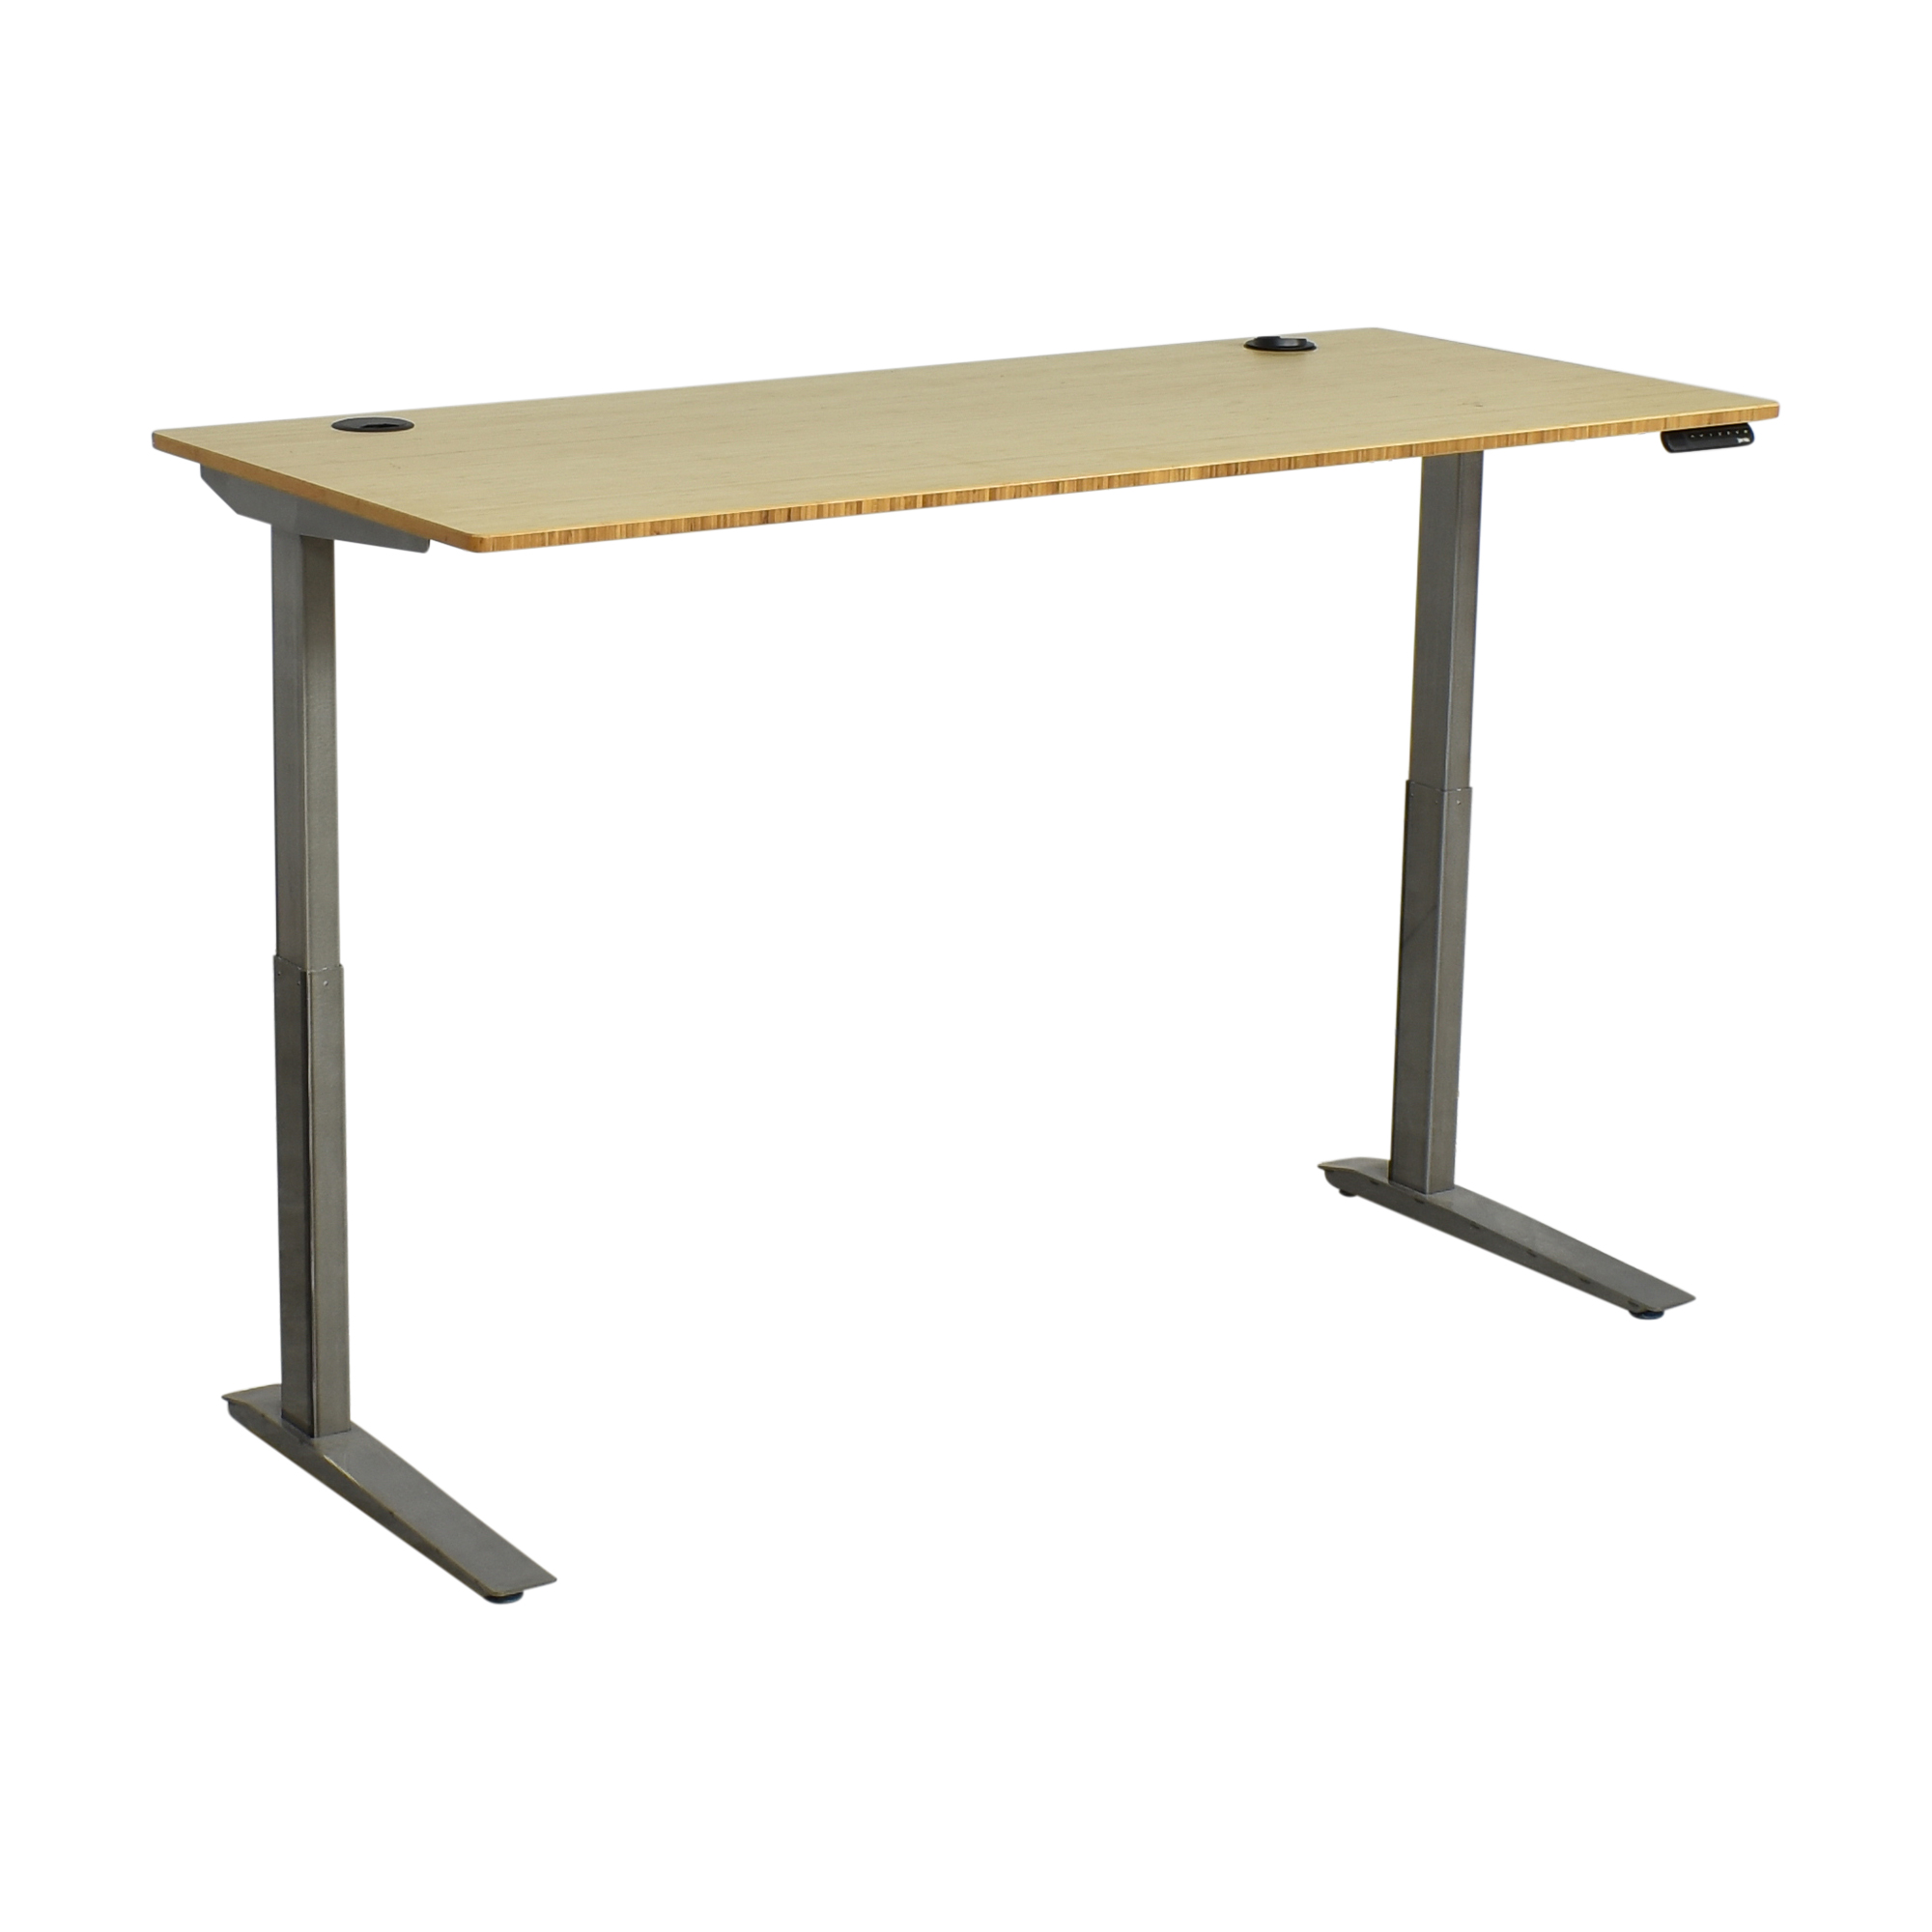 Fully Jarvis Adjustable Standing Desk / Tables